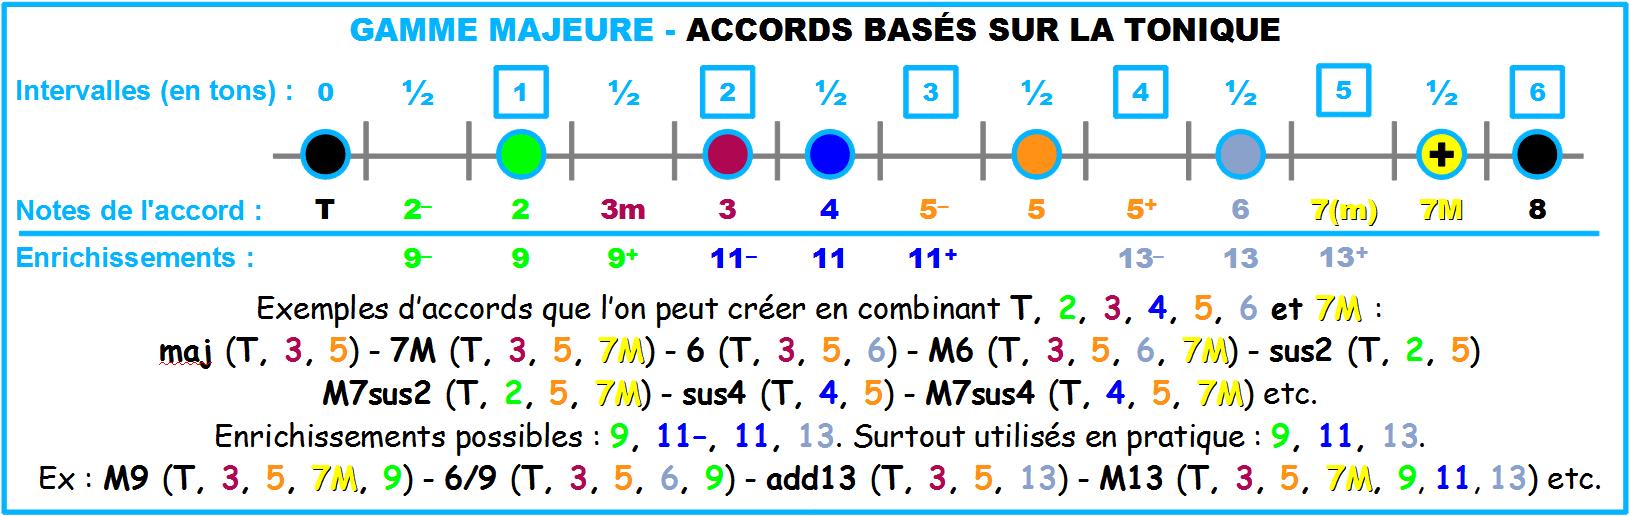 Gamme-Majeure-Accords-bases-sur-tonique